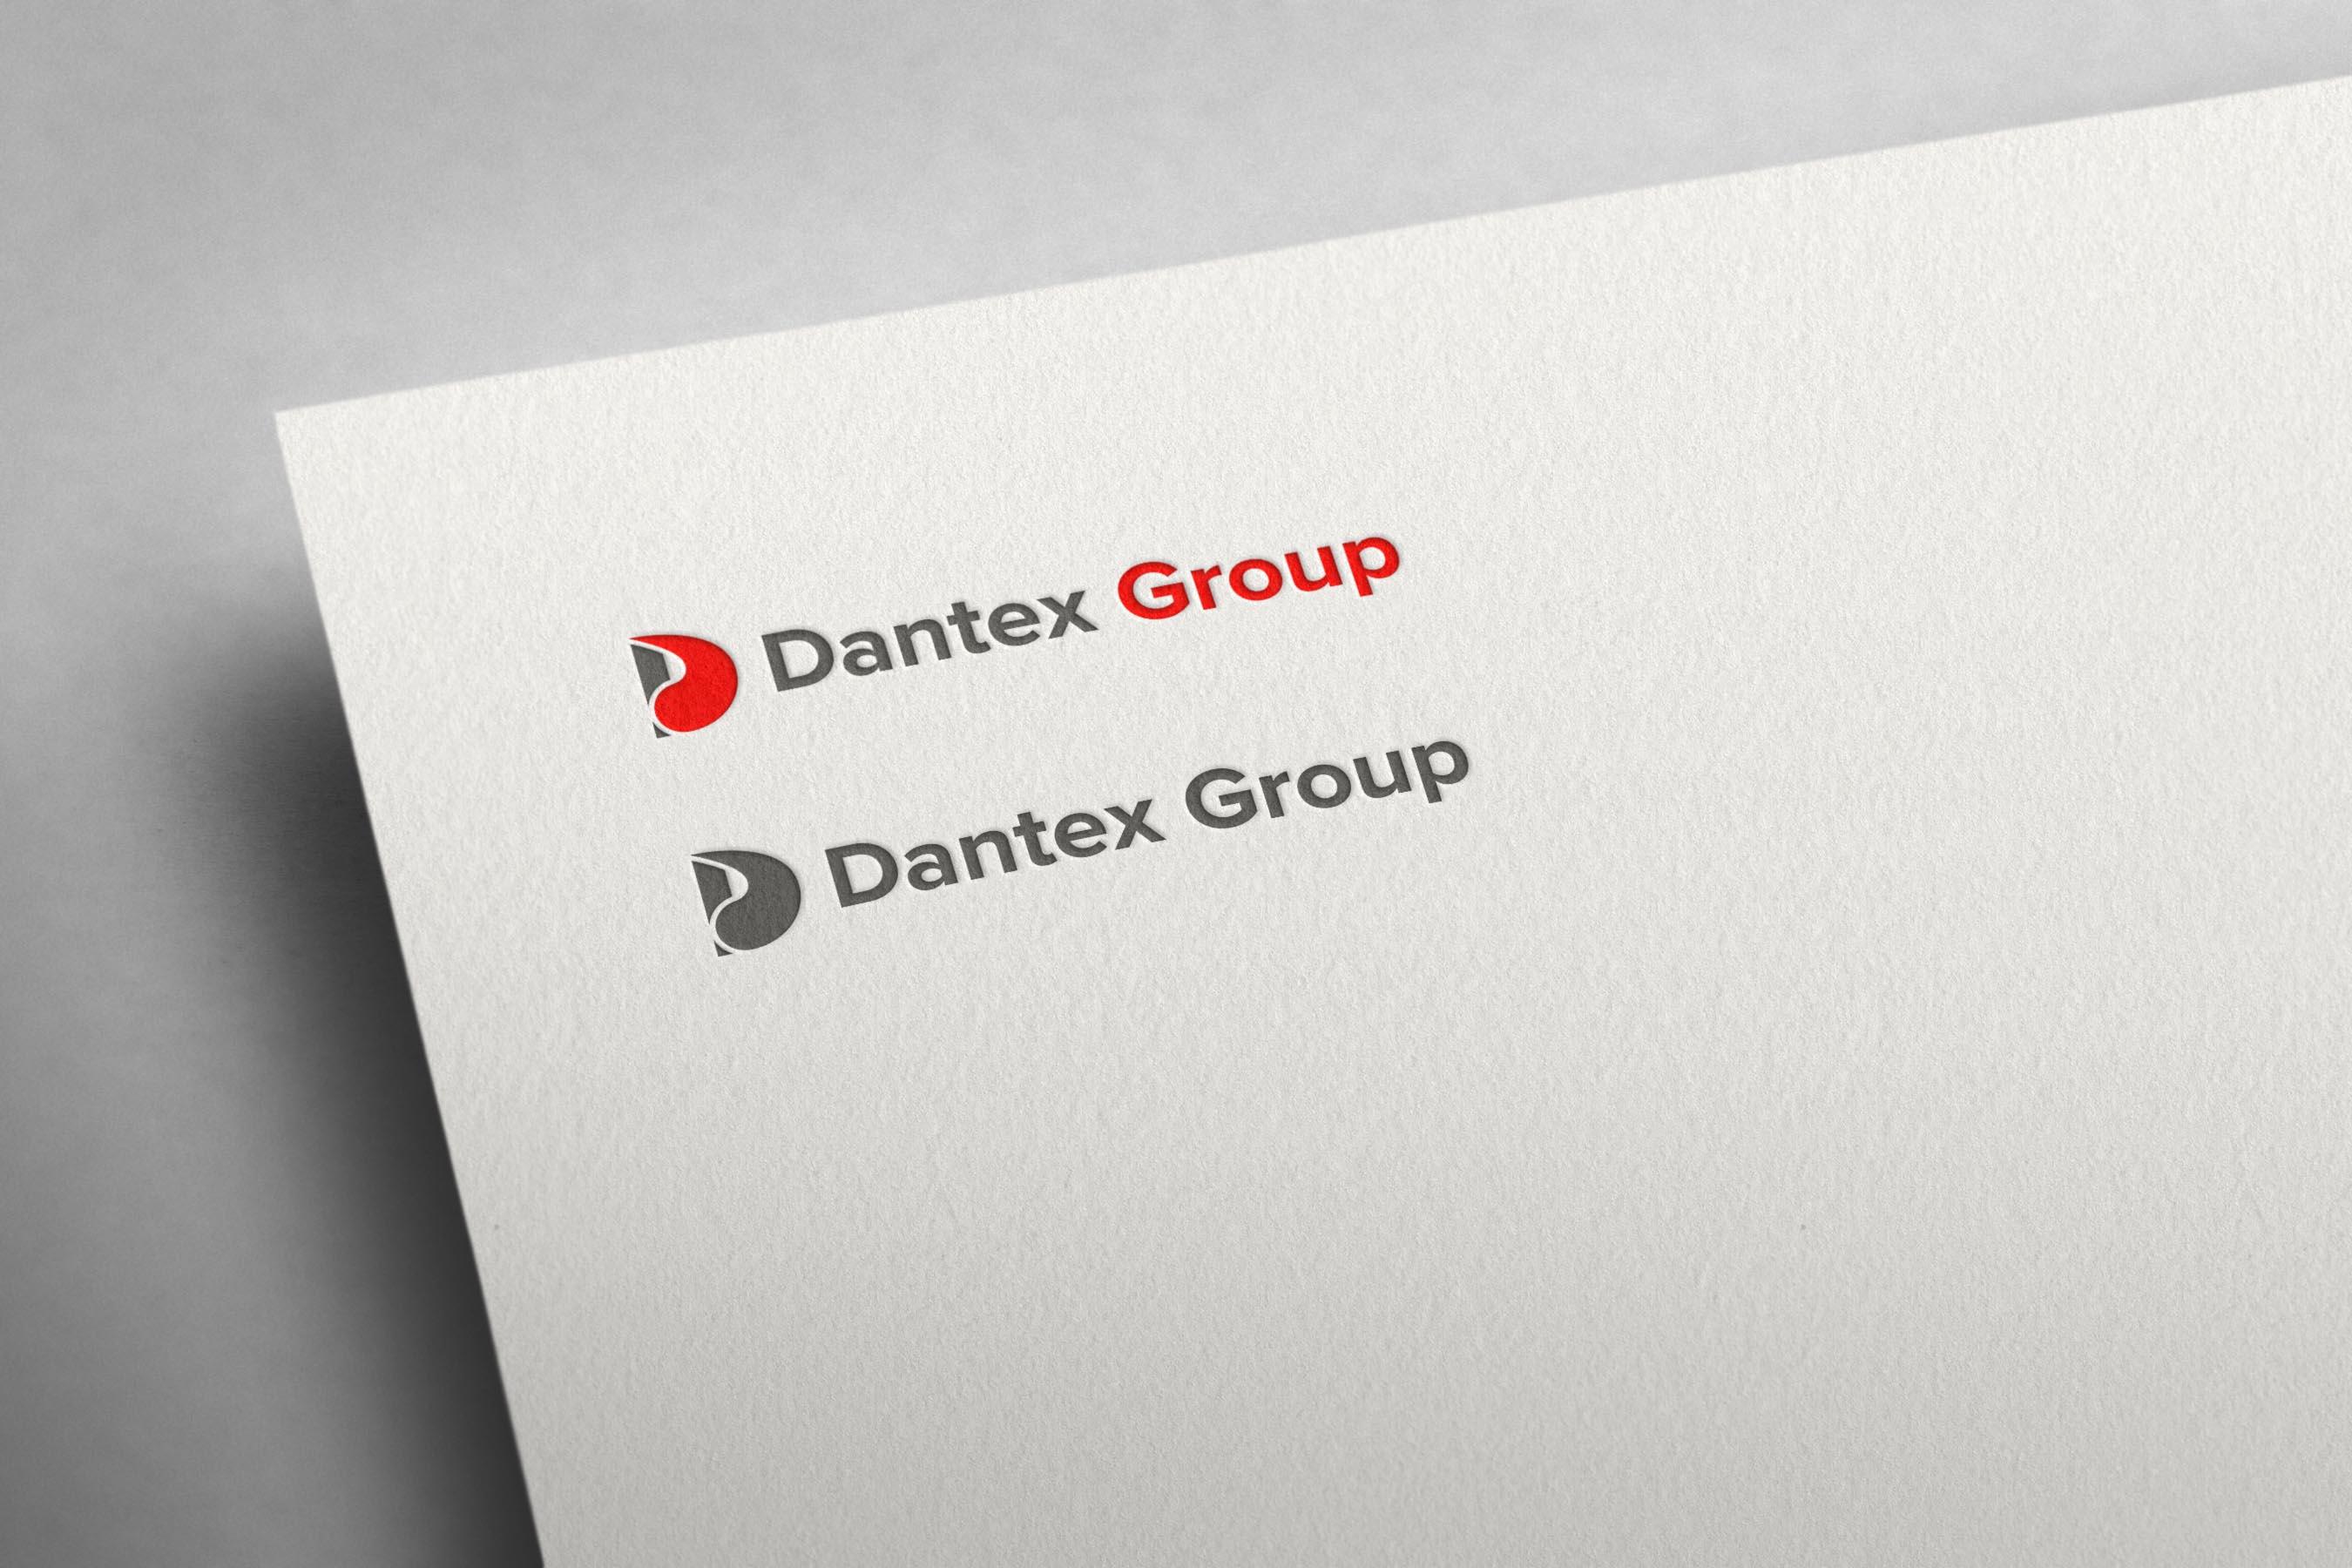 Конкурс на разработку логотипа для компании Dantex Group  фото f_7245bff735143c6a.jpg